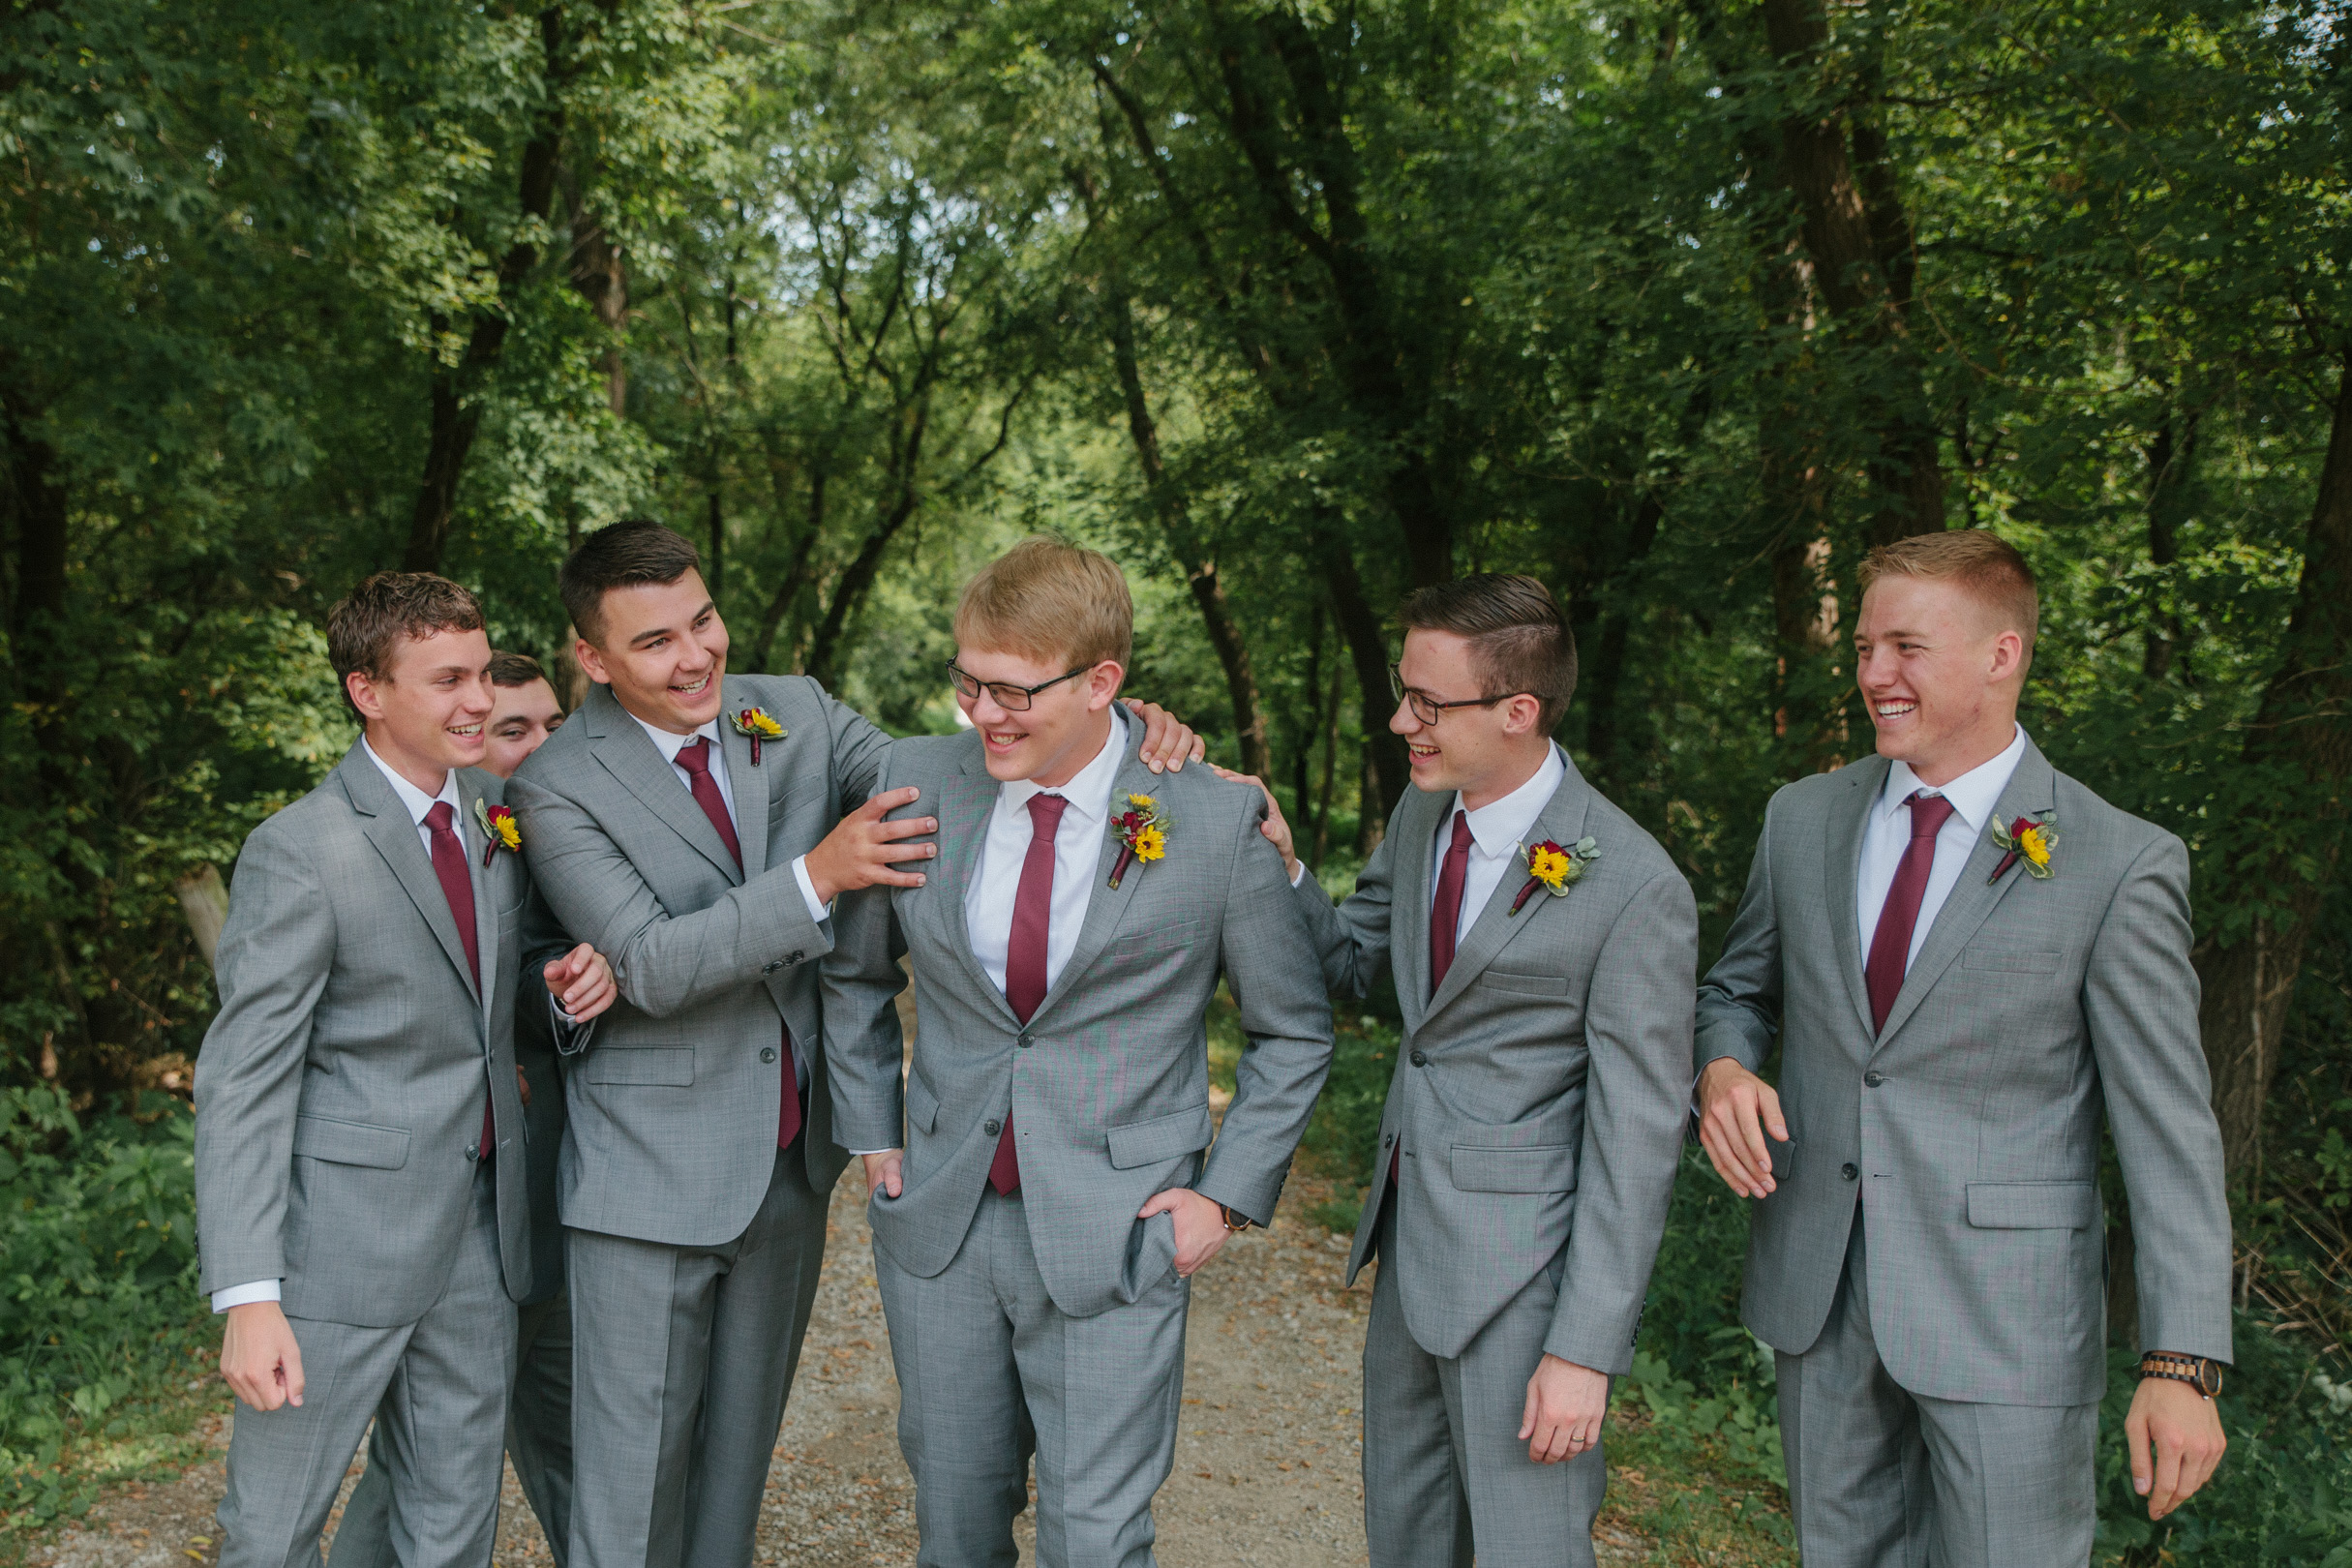 groomsmen photos with groom